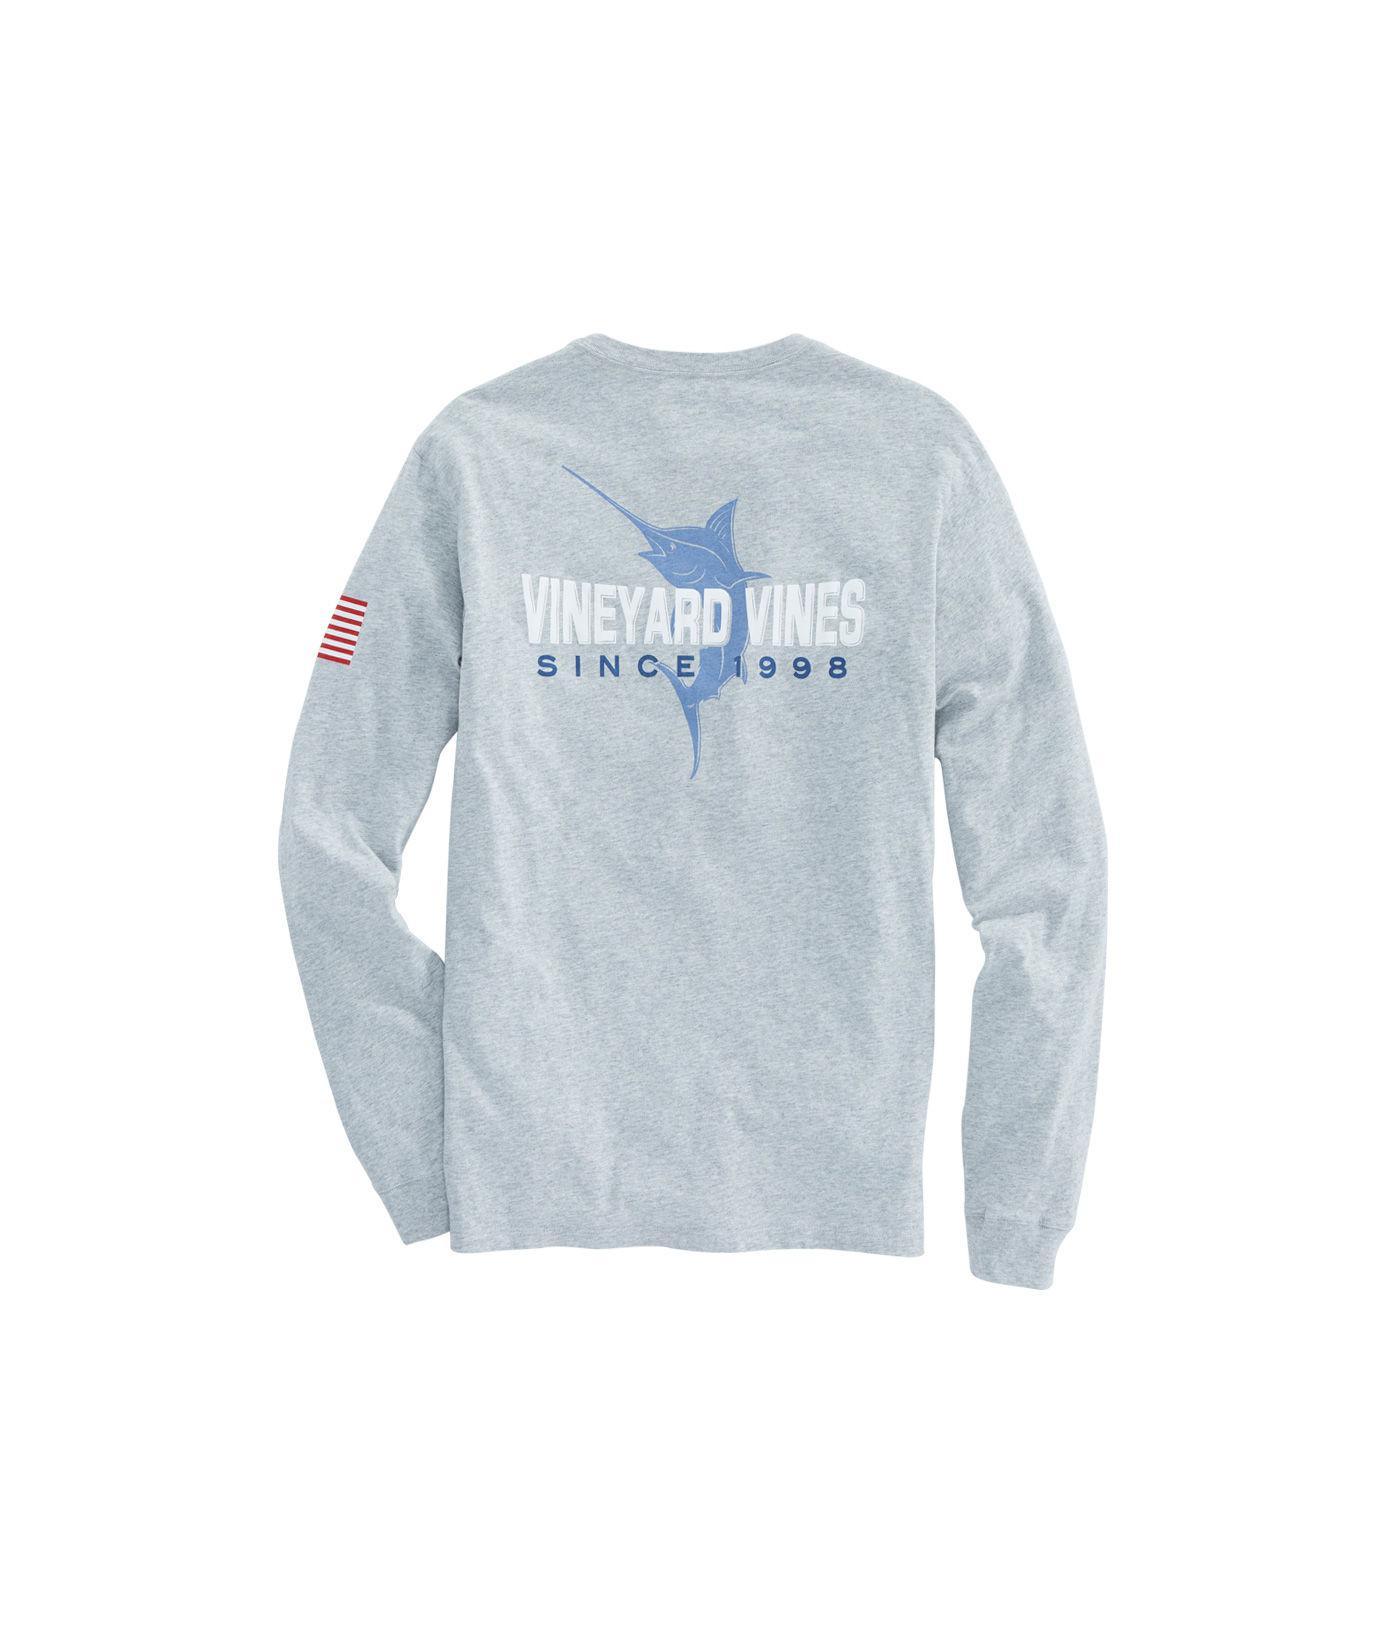 3a2d4505c Lyst - Vineyard Vines Long-sleeve 98 Marlin Pocket T-shirt in Blue ...